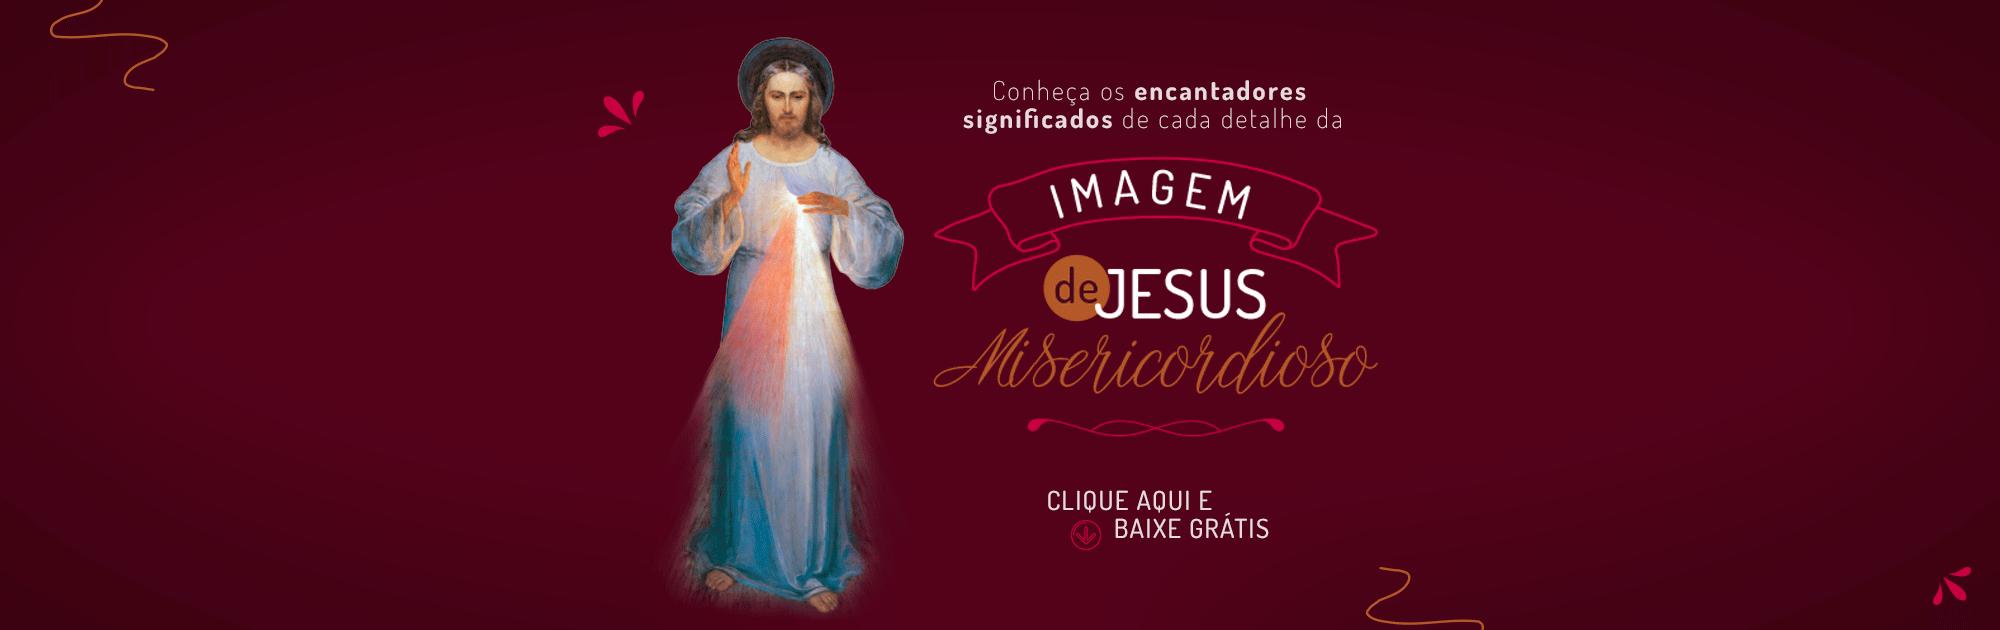 Banner Blog (Imagem de Jesus Misericordioso) - Santuário Divina Misericórdia - Curitiba:PR